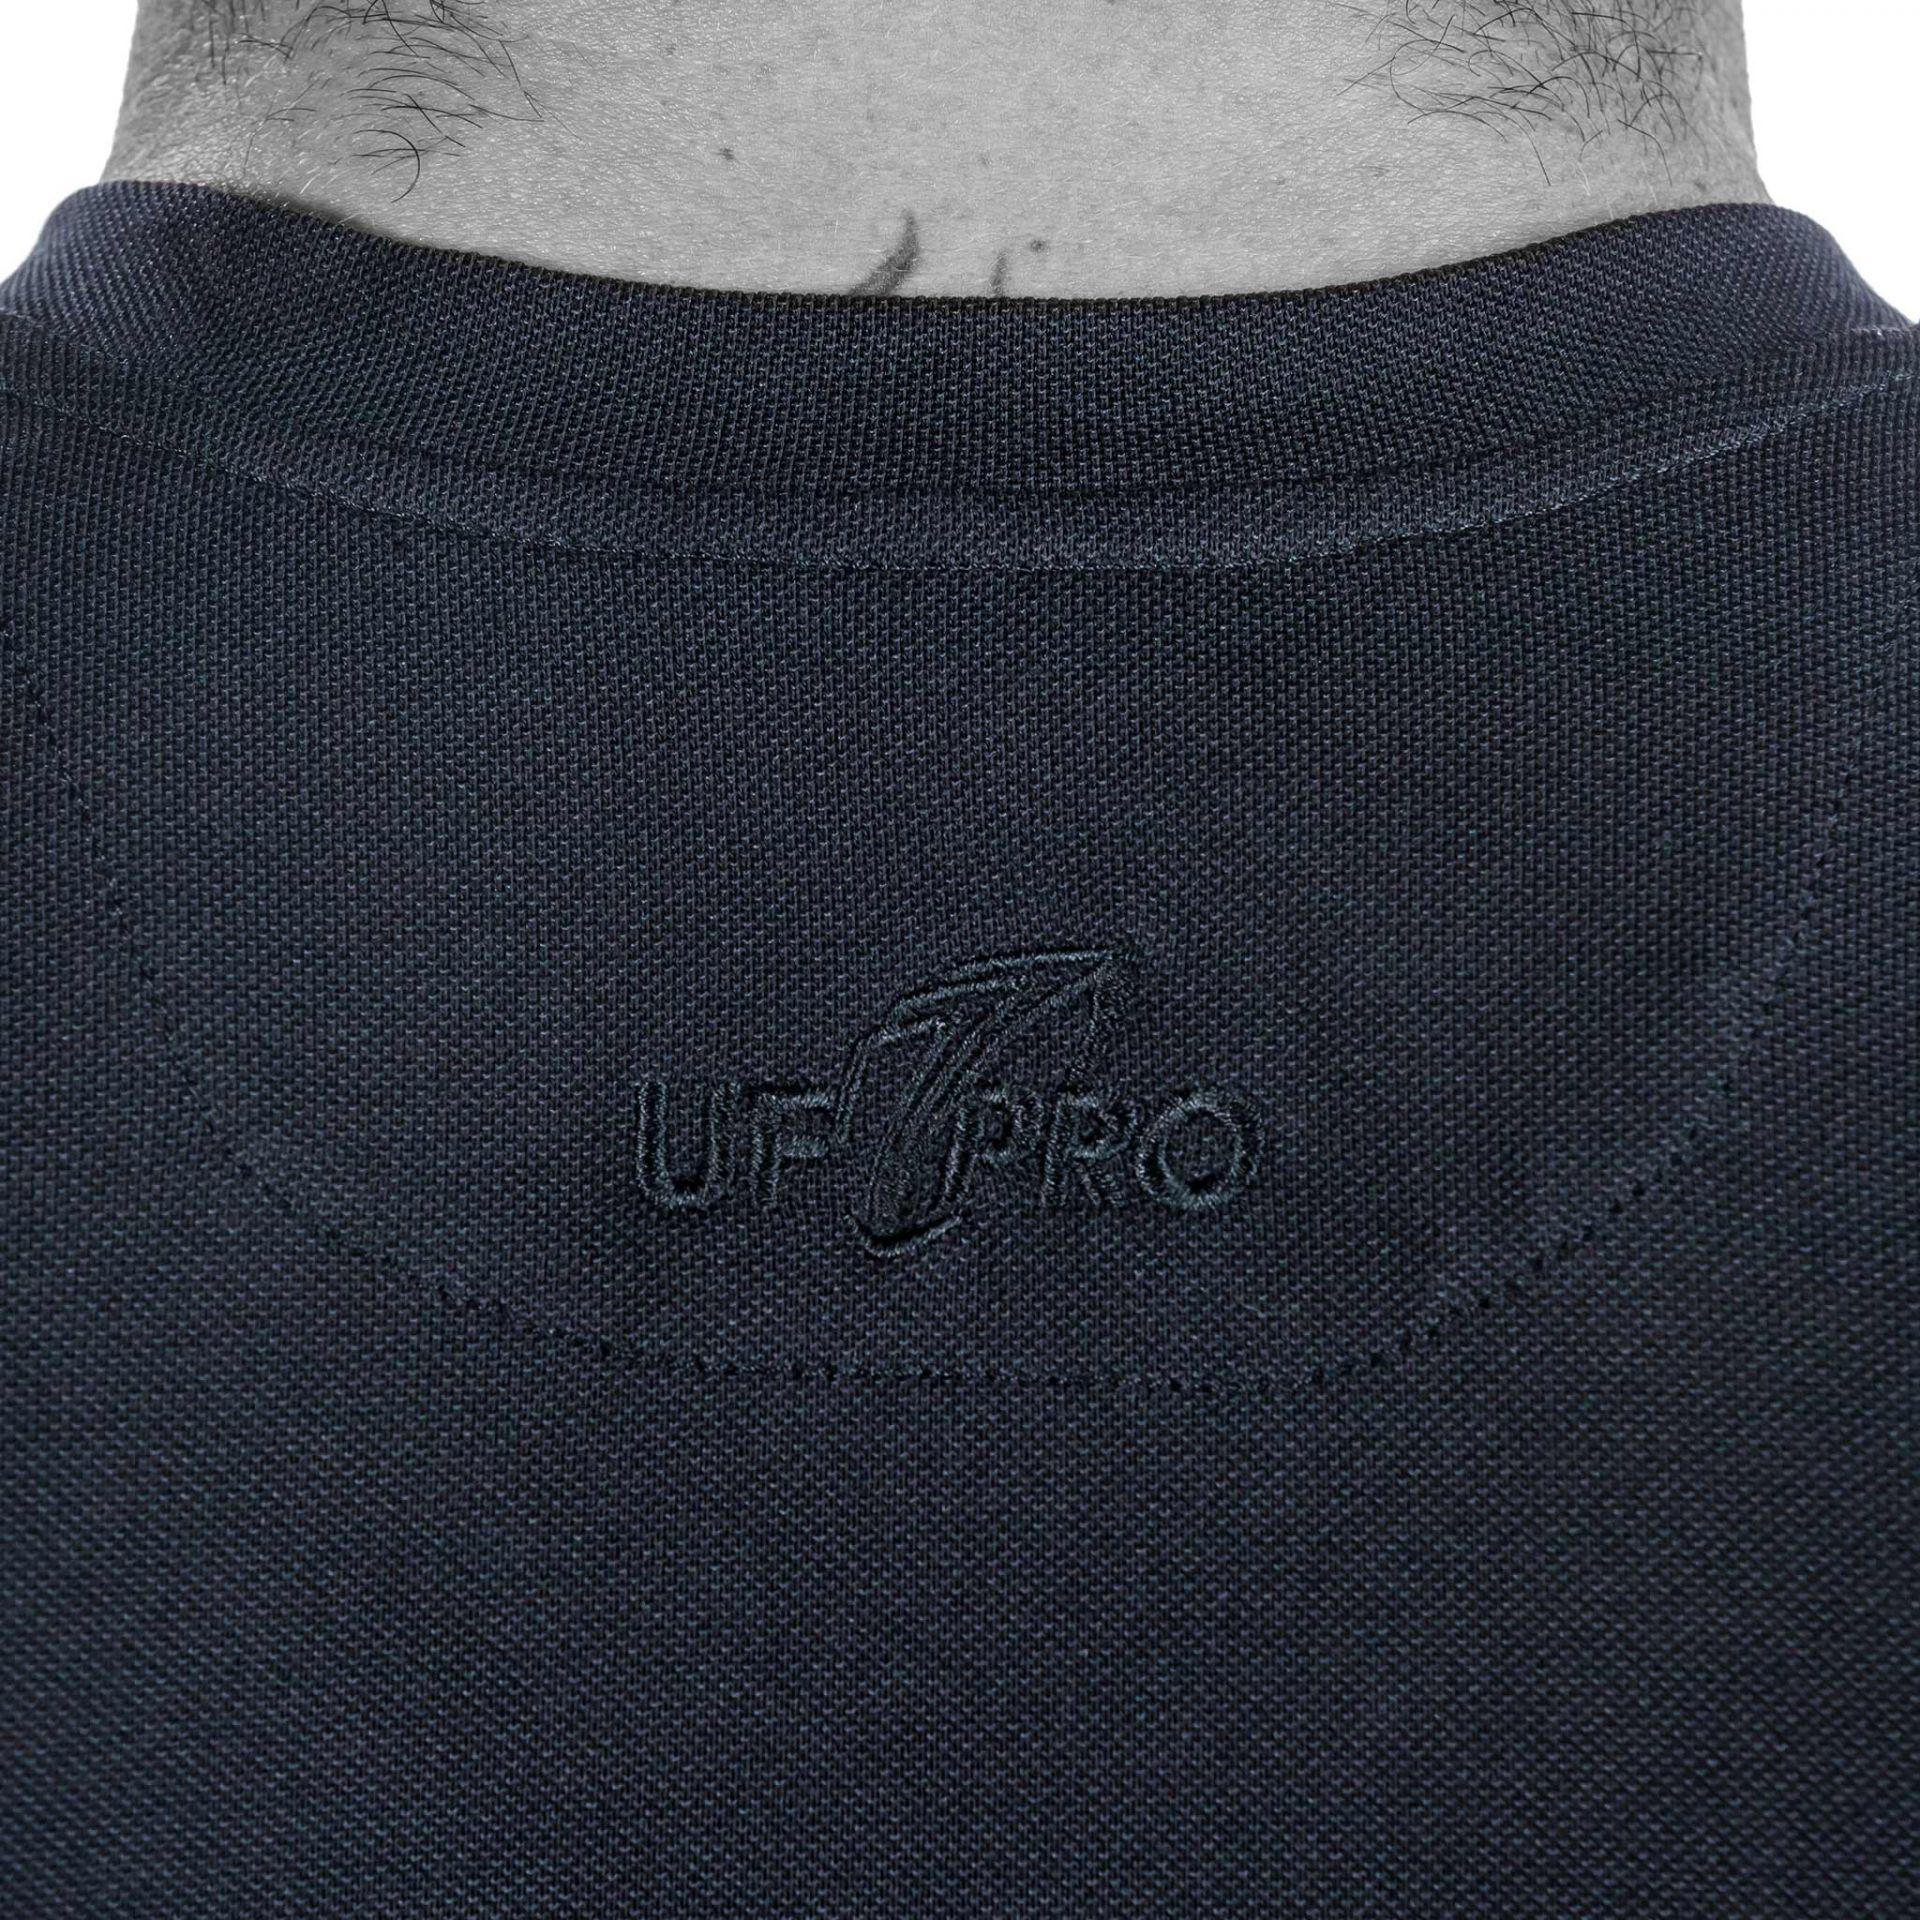 Urban T Shirt Everyday Carry Shirt Uf Pro